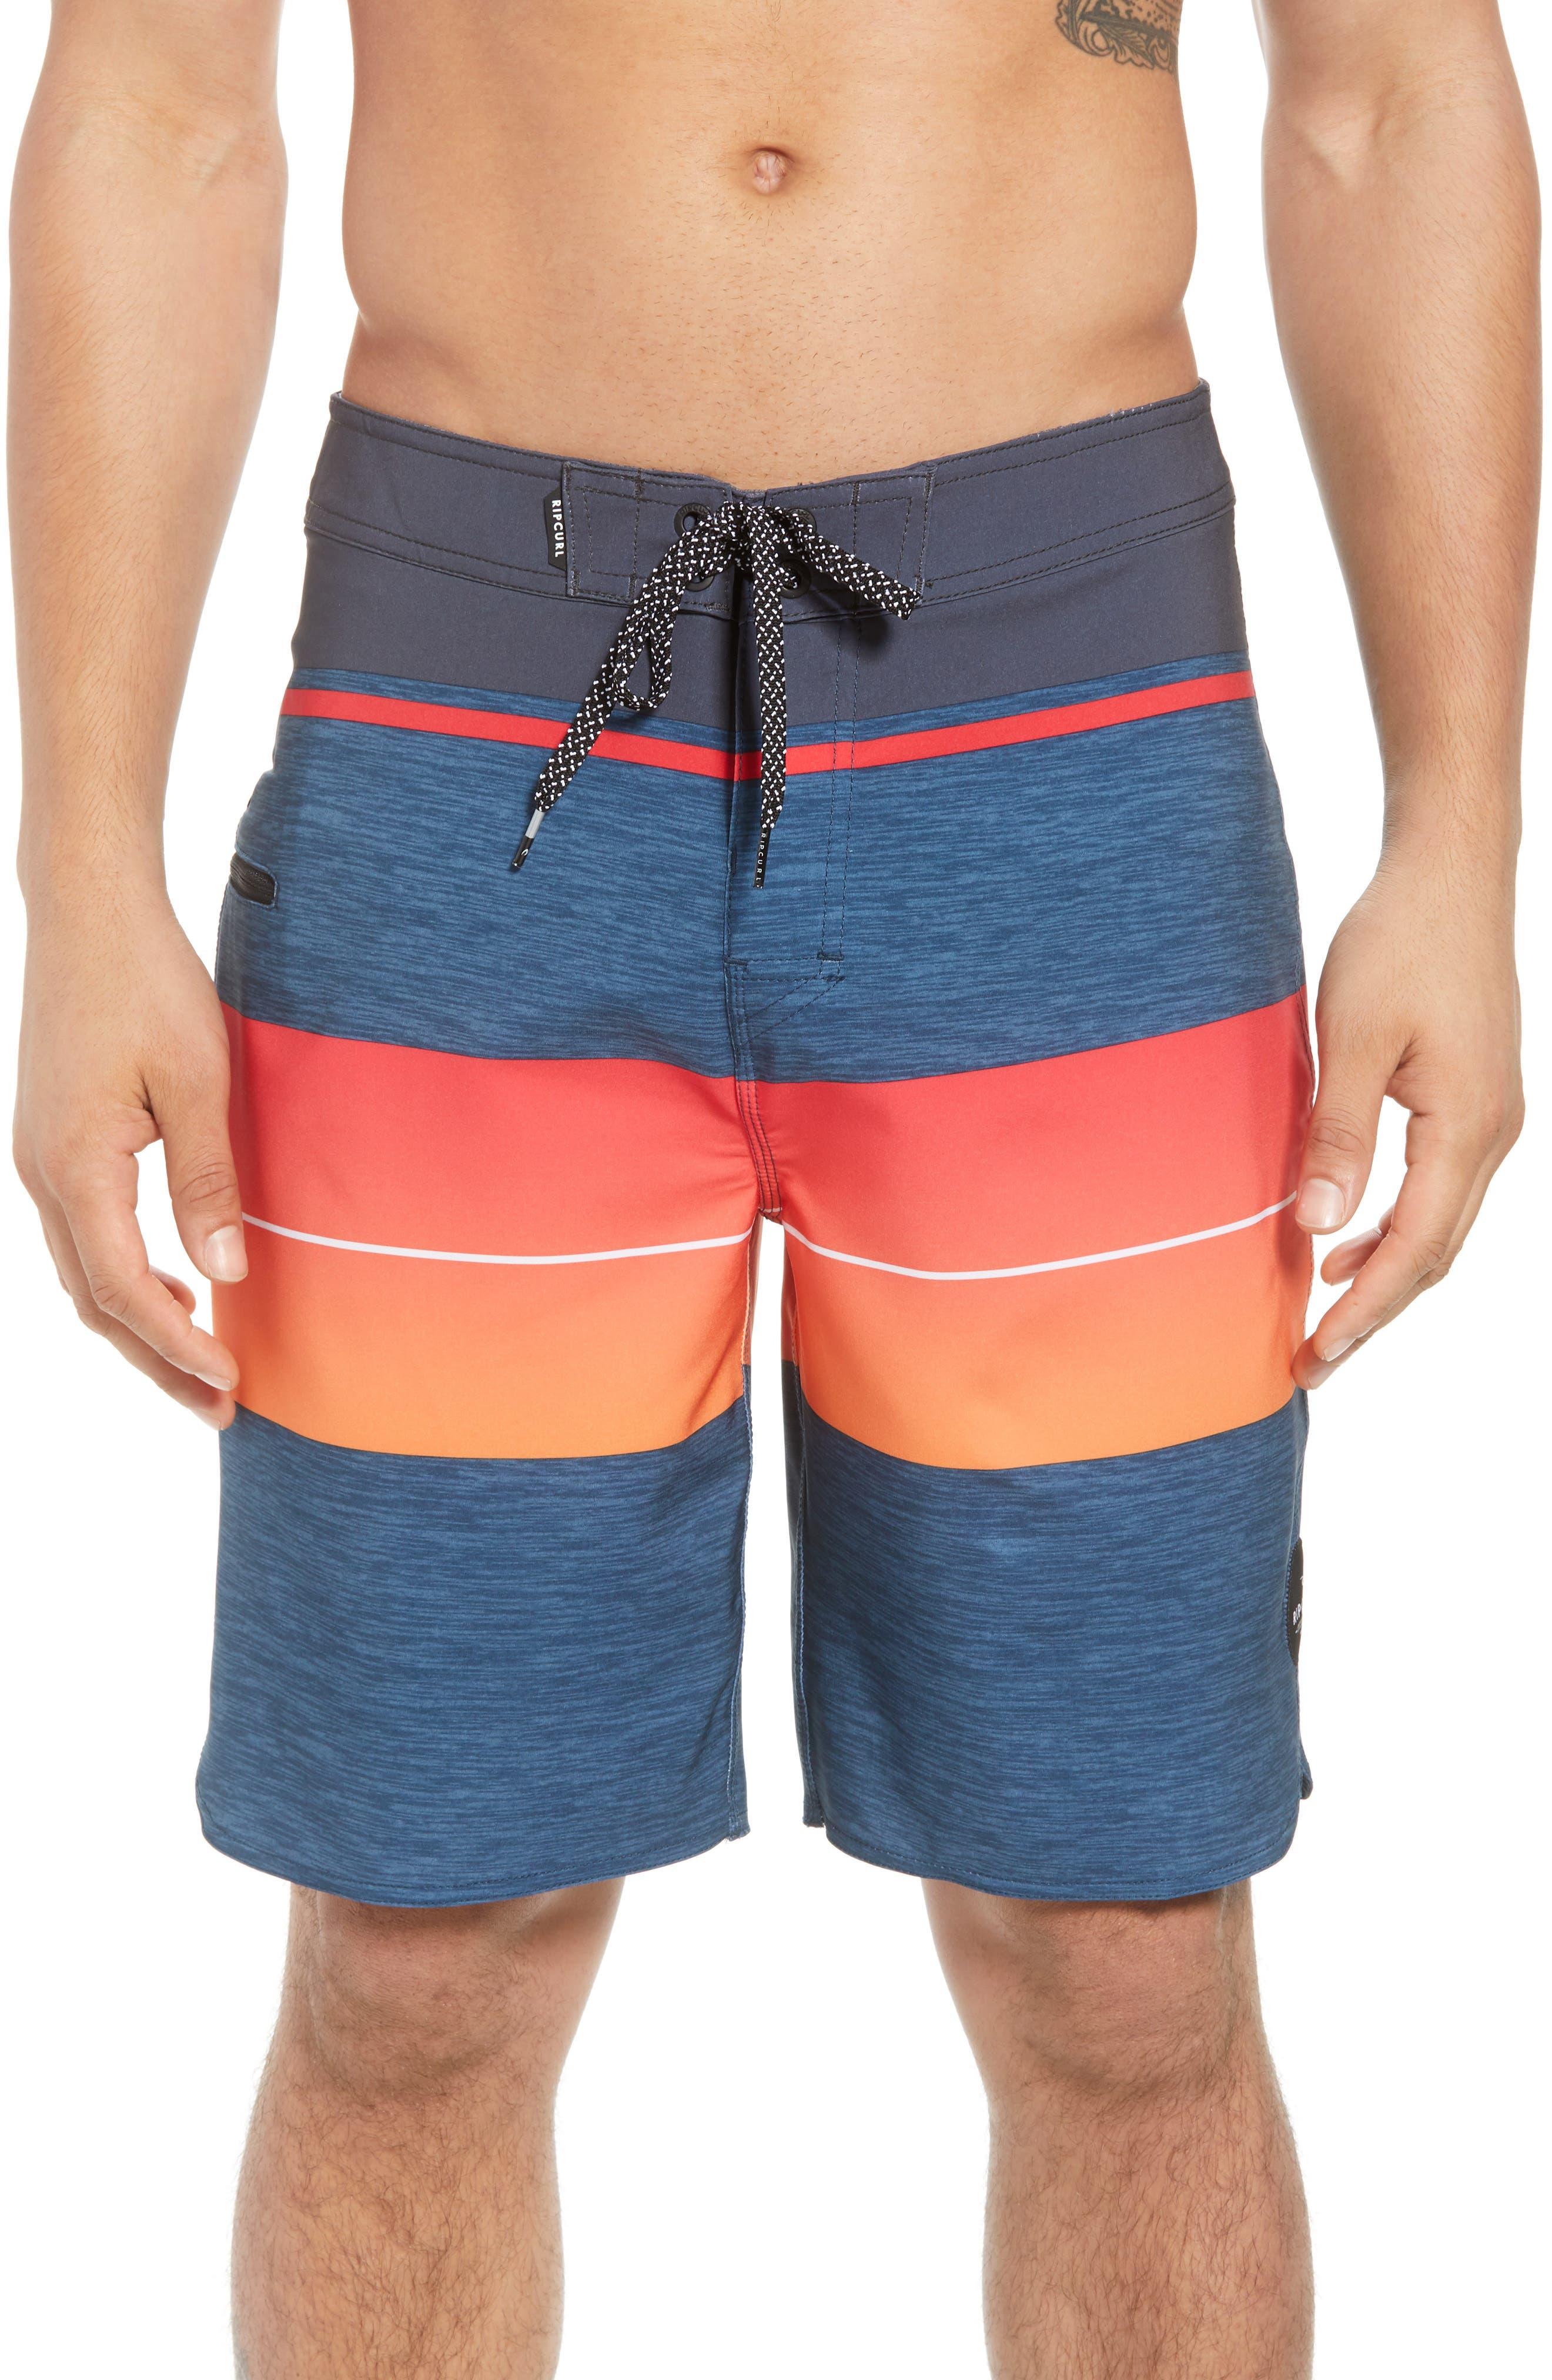 Mirage Eclipse Board Shorts,                         Main,                         color, Orange